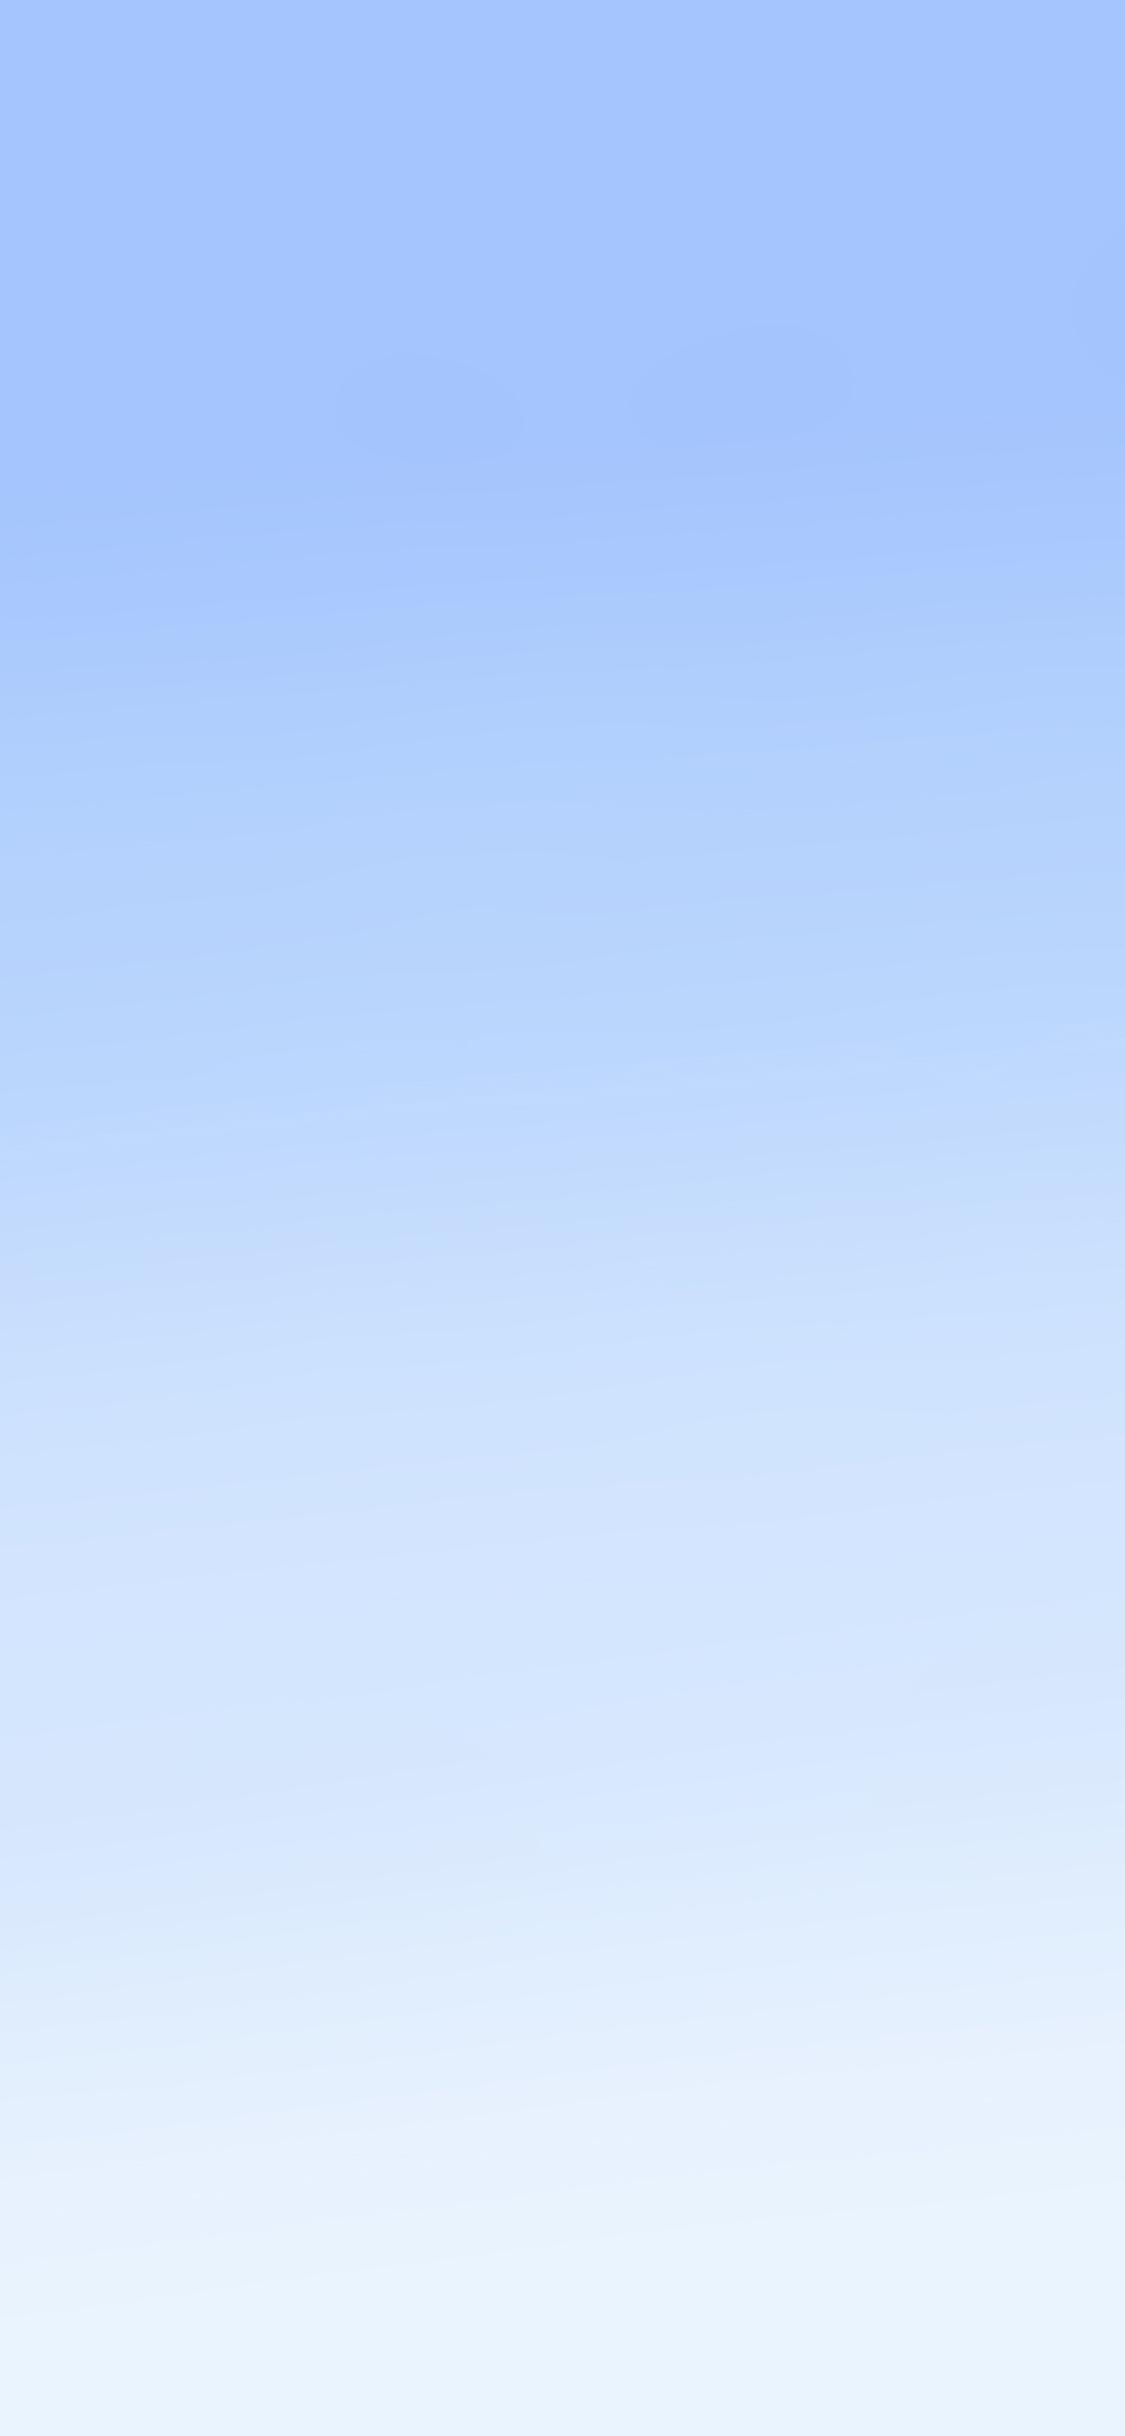 Iphonexpapers Sg20 Light Blue Gradation Blur